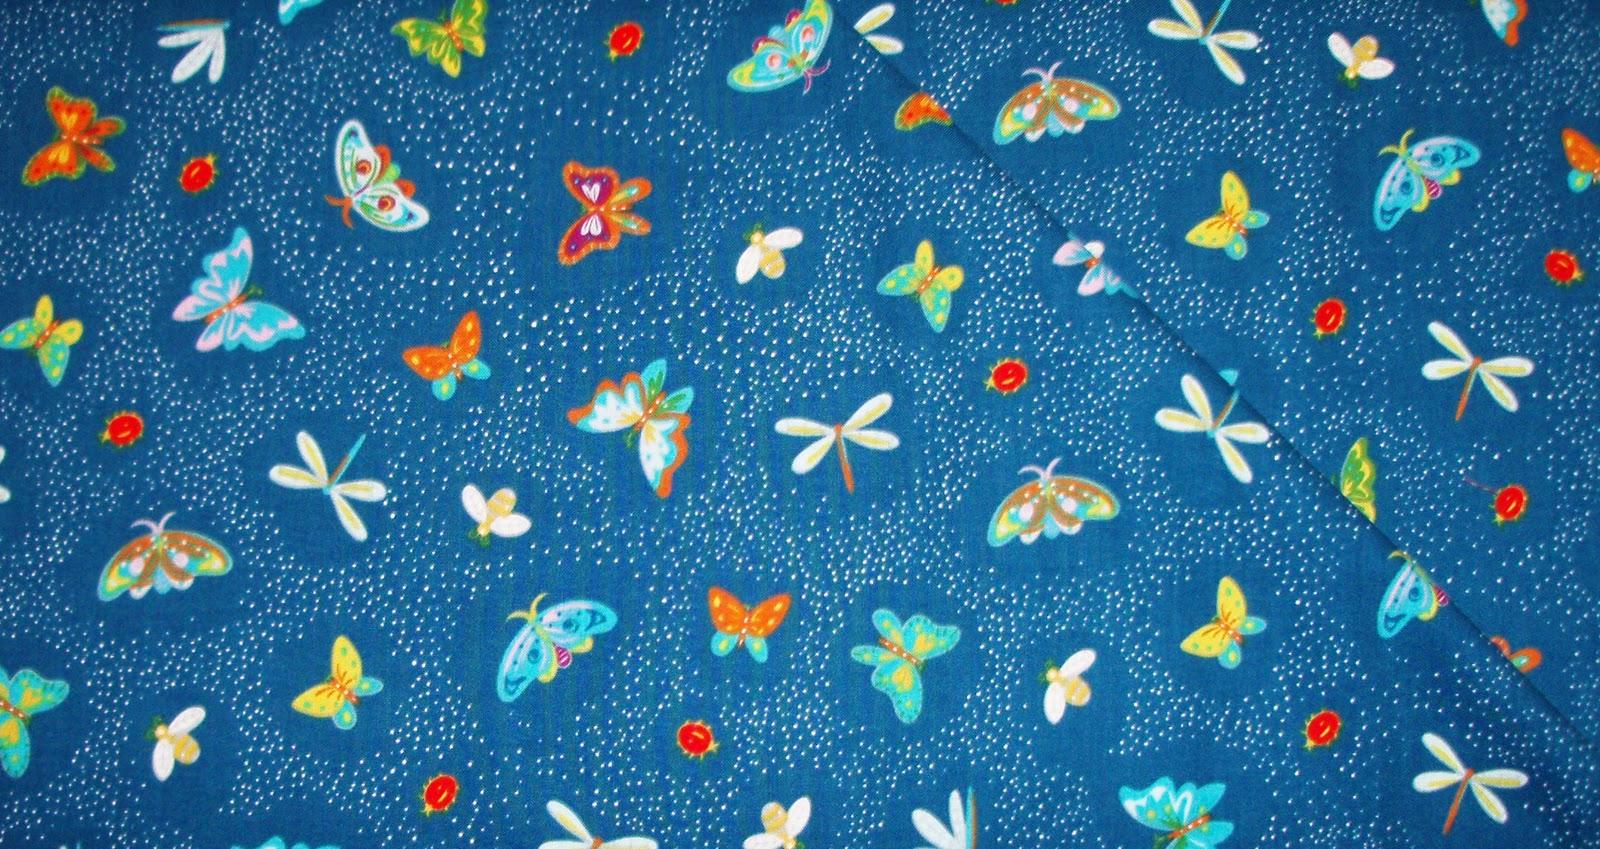 Delphine 39 s quilt shop new kids 39 fabrics for Kids apparel fabric